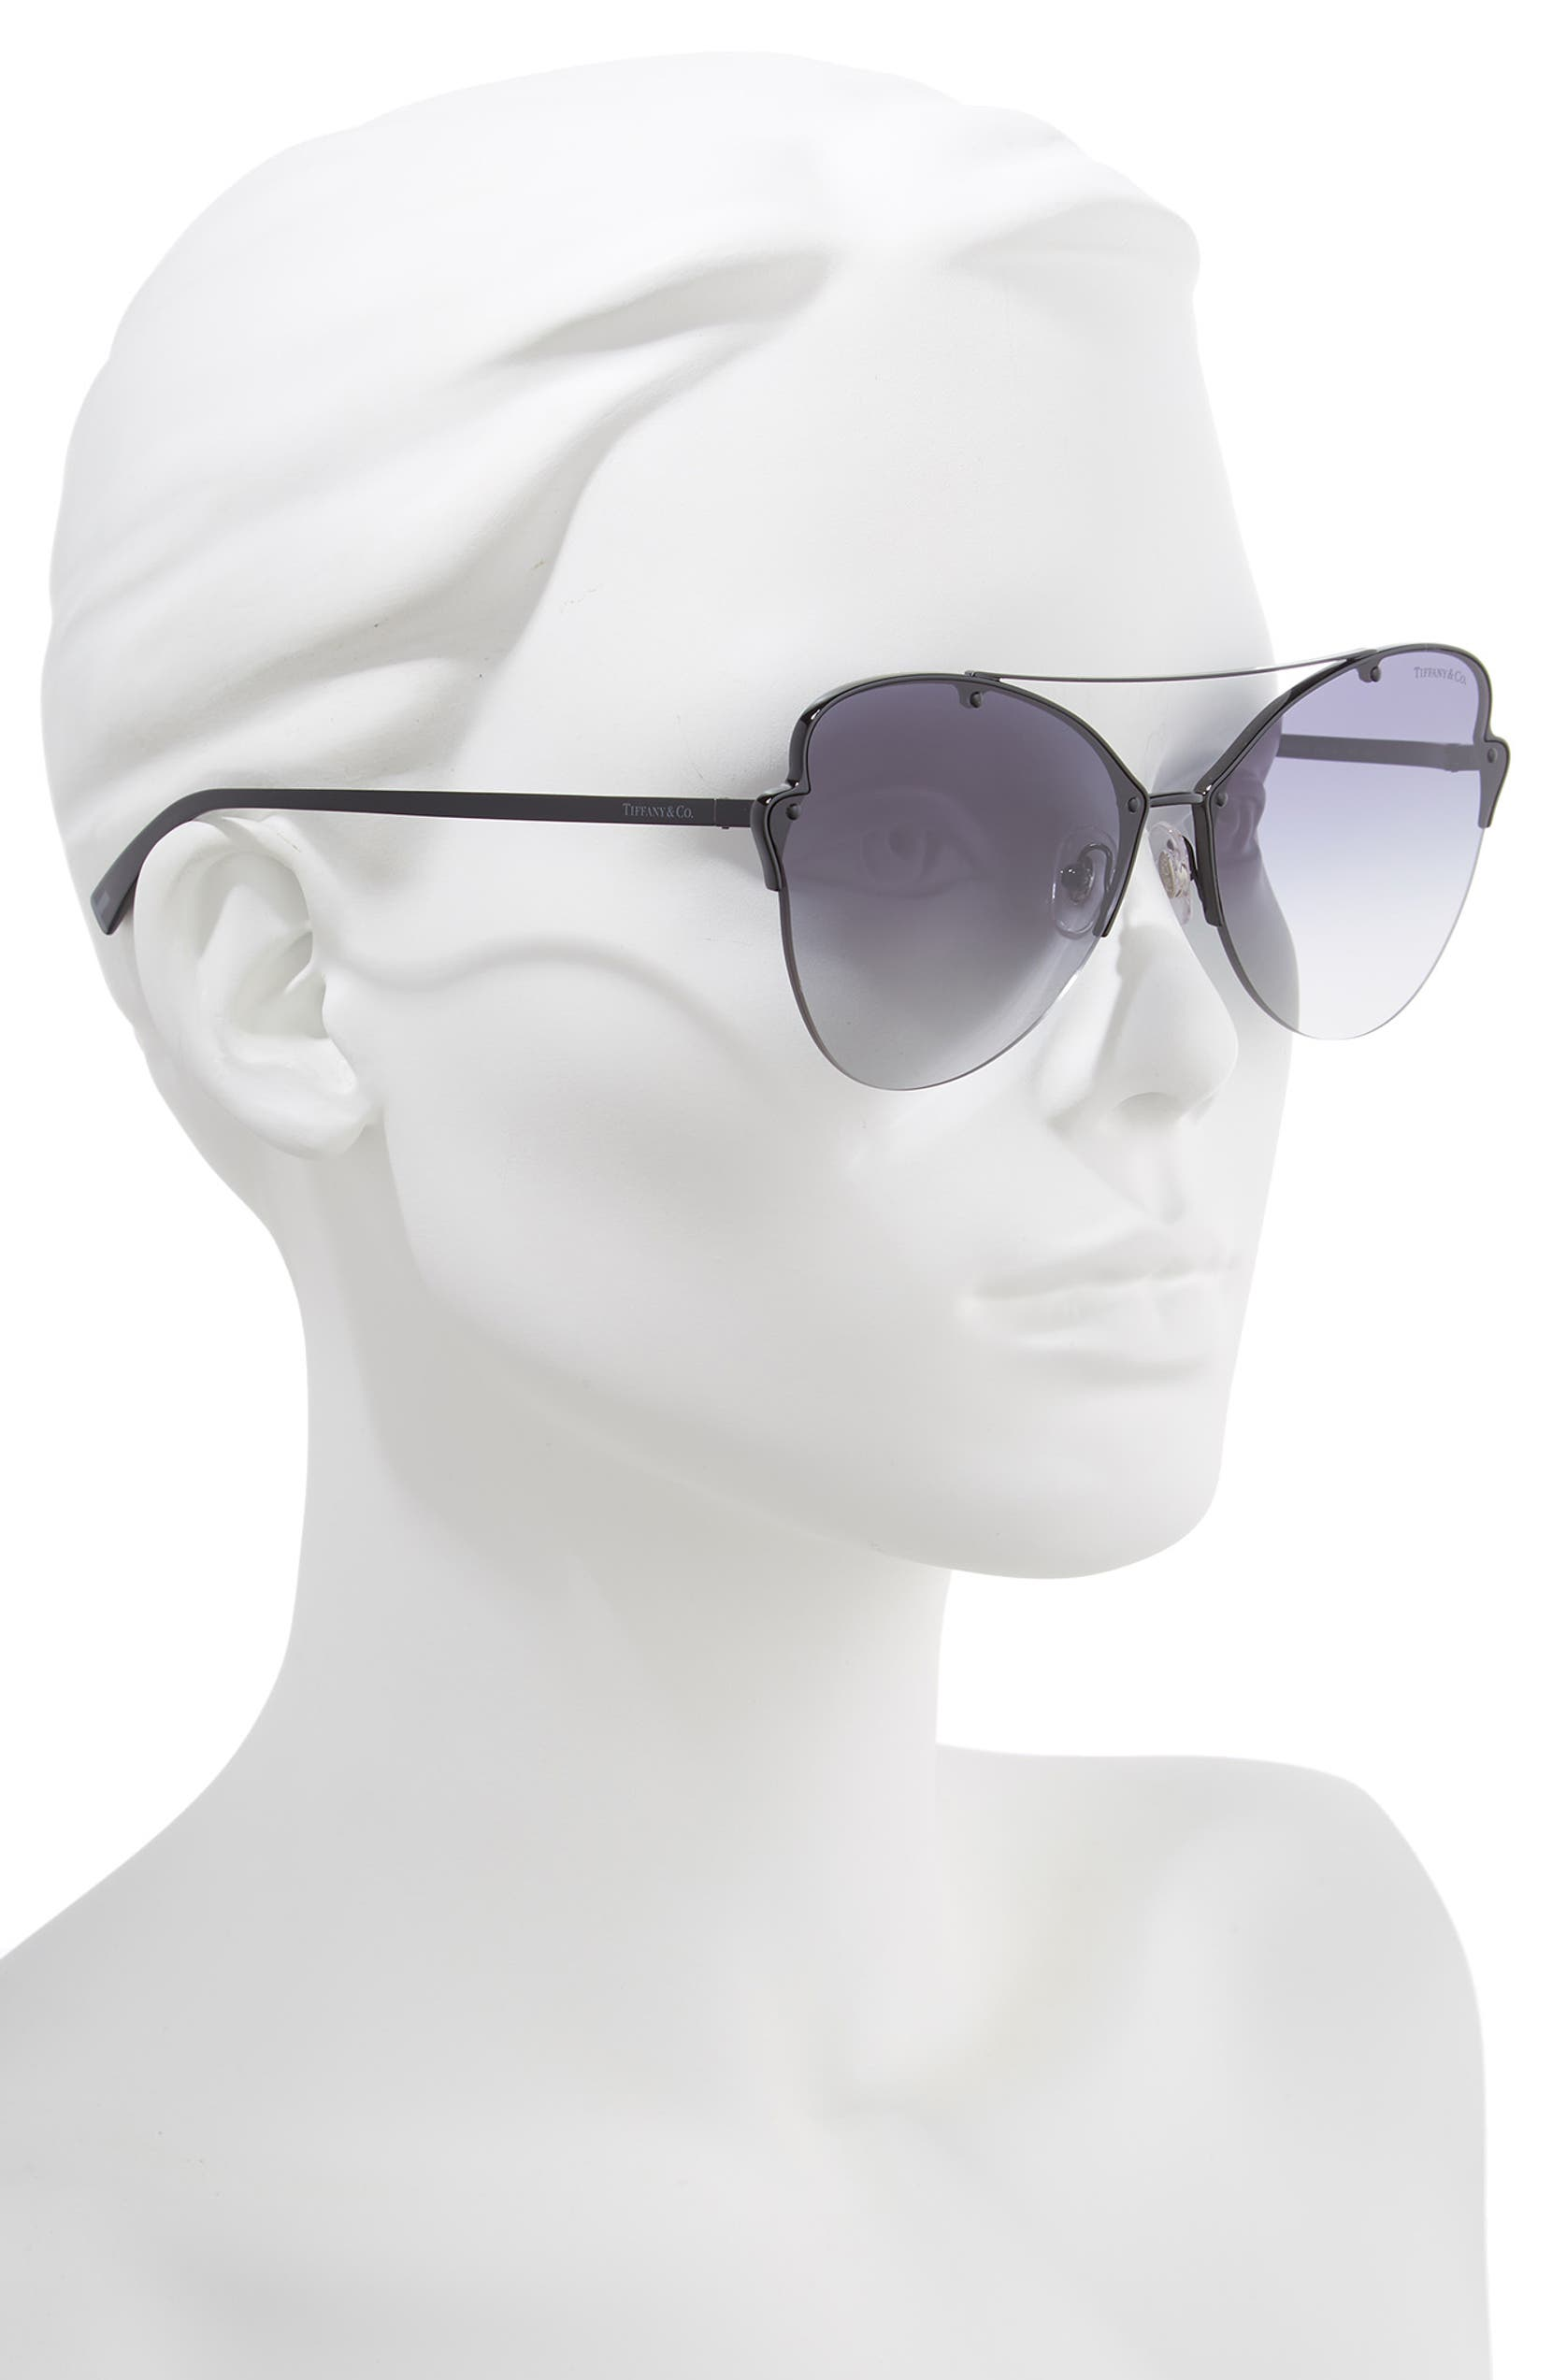 2fde2b22b8ecb Tiffany   Co. 64mm Oversize Butterfly Sunglasses